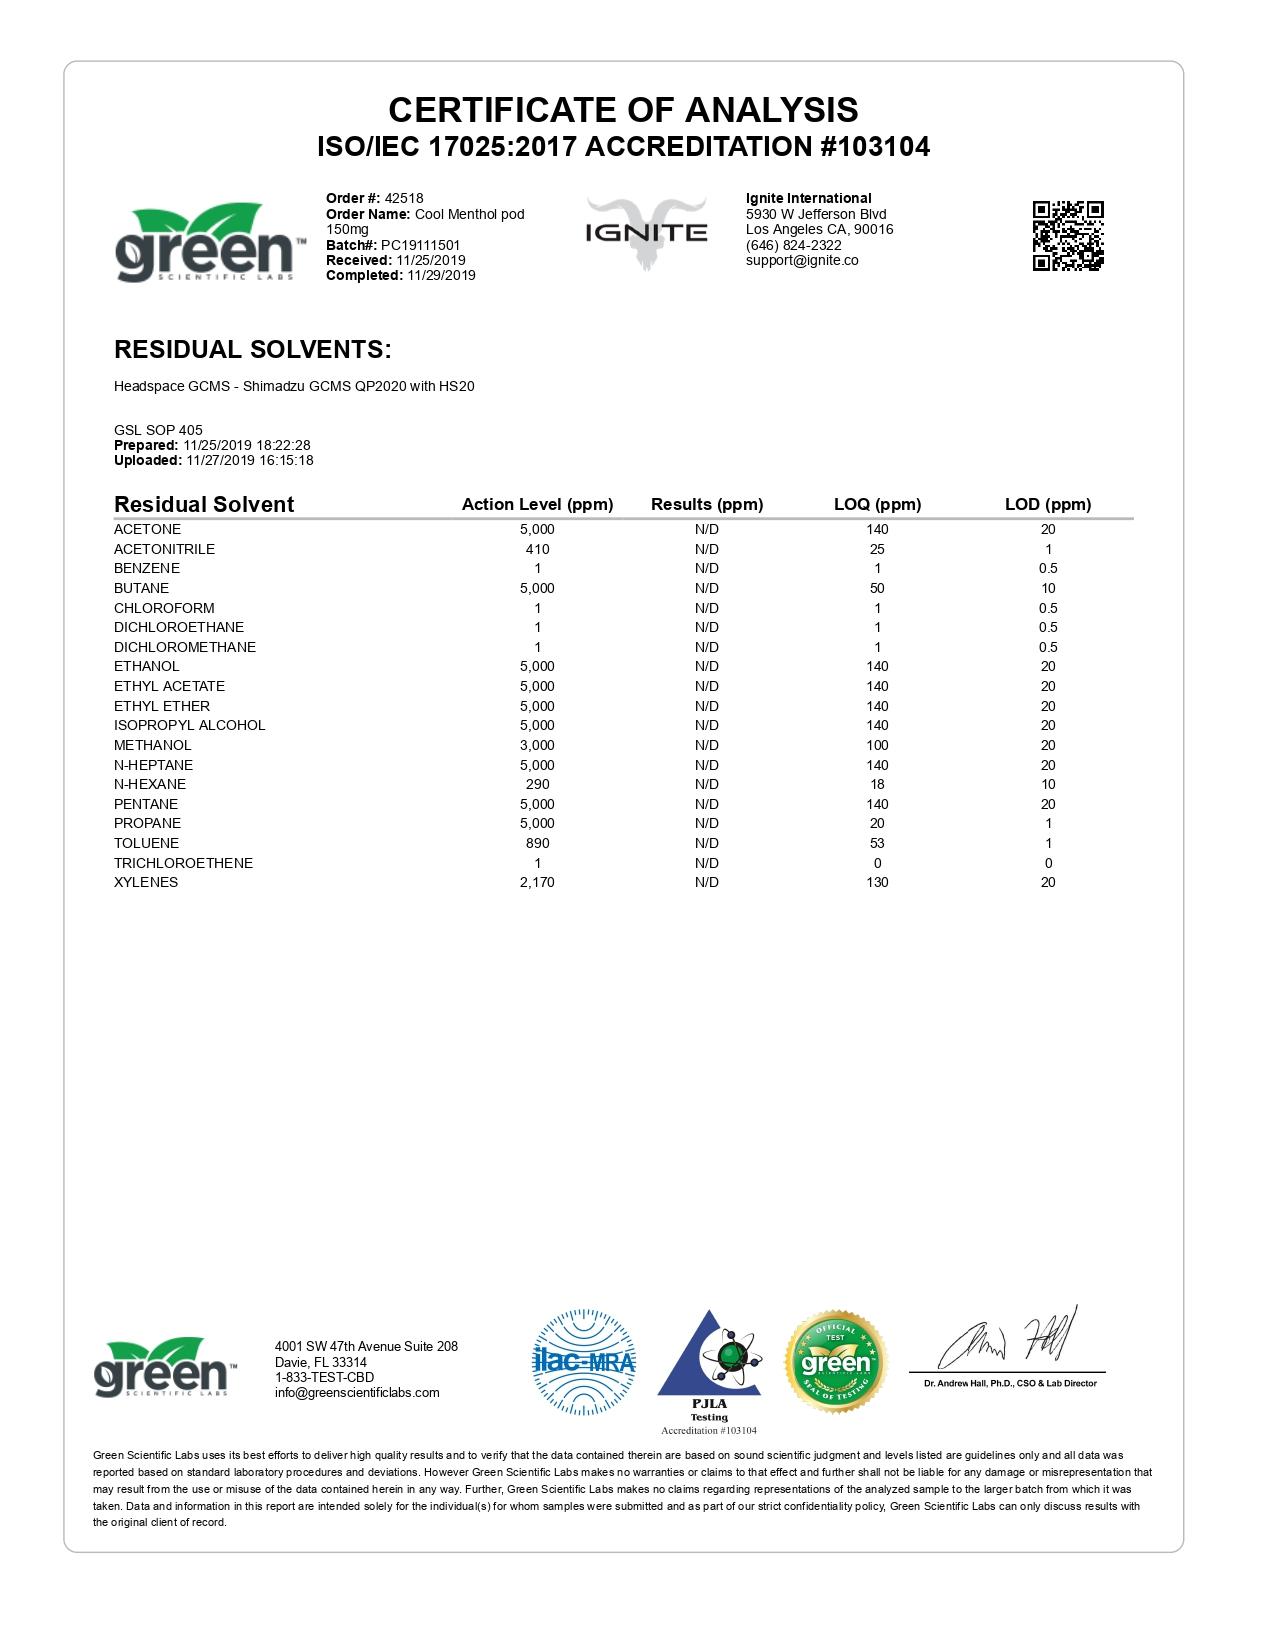 IGNITE CBD Pod Cool Menthol Lab Report